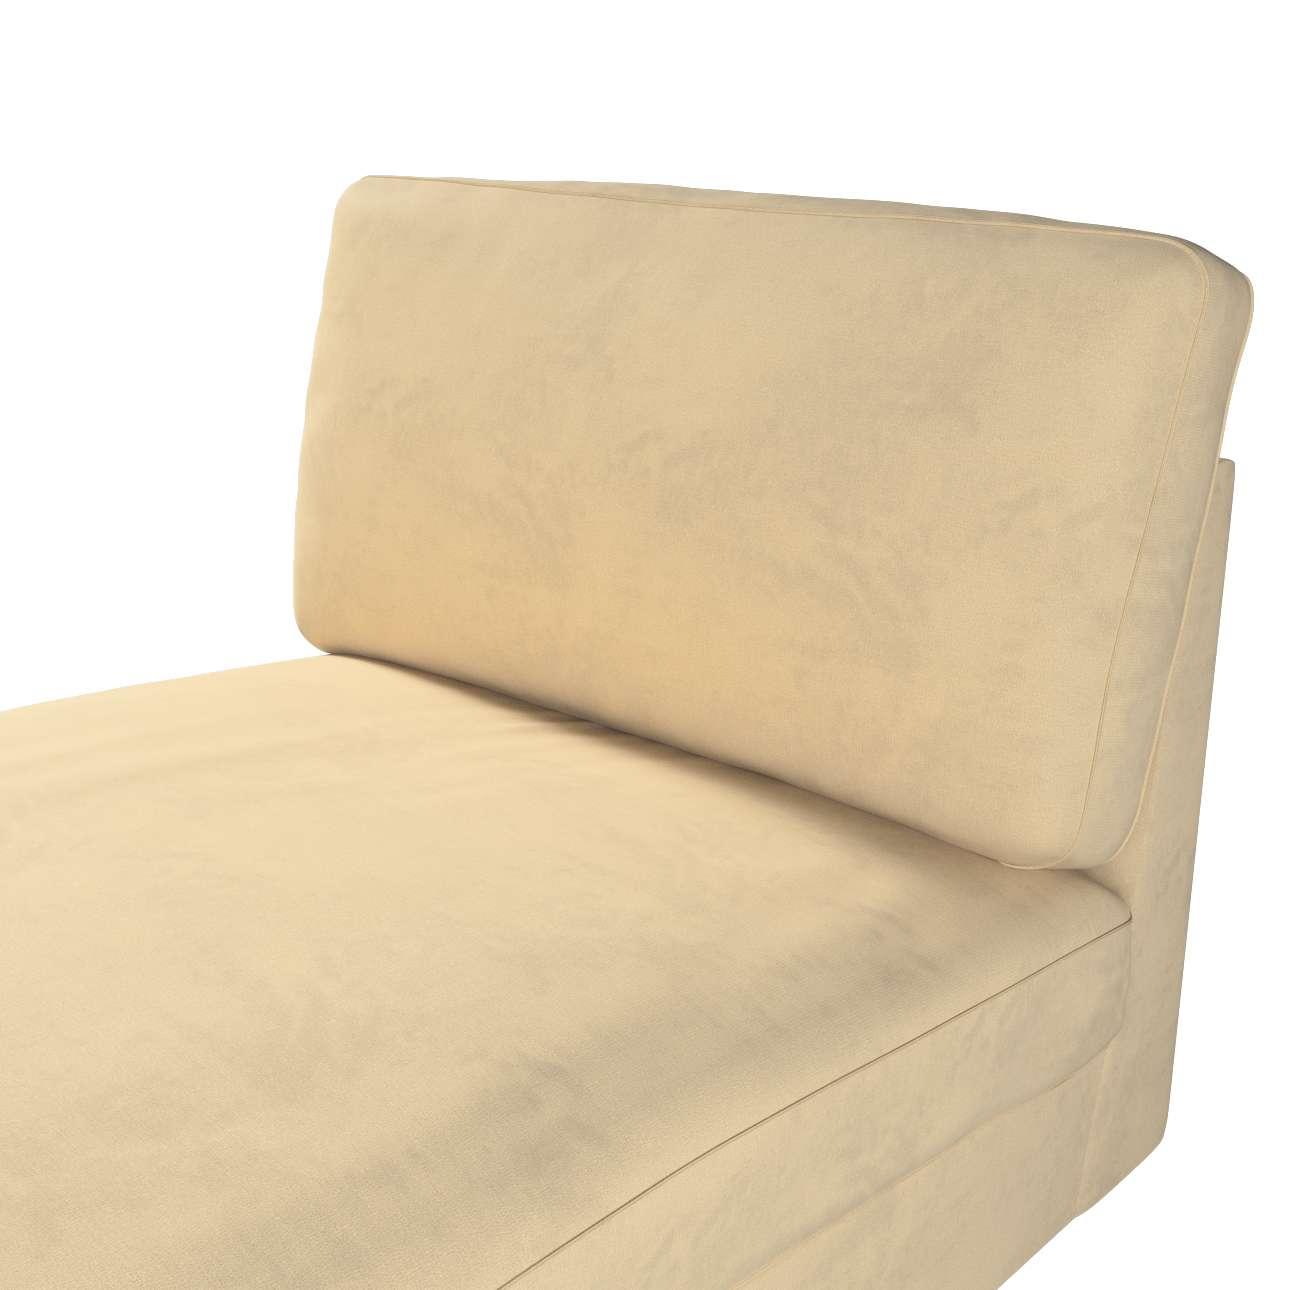 Pokrowiec na szezlong Kivik w kolekcji Living, tkanina: 160-82